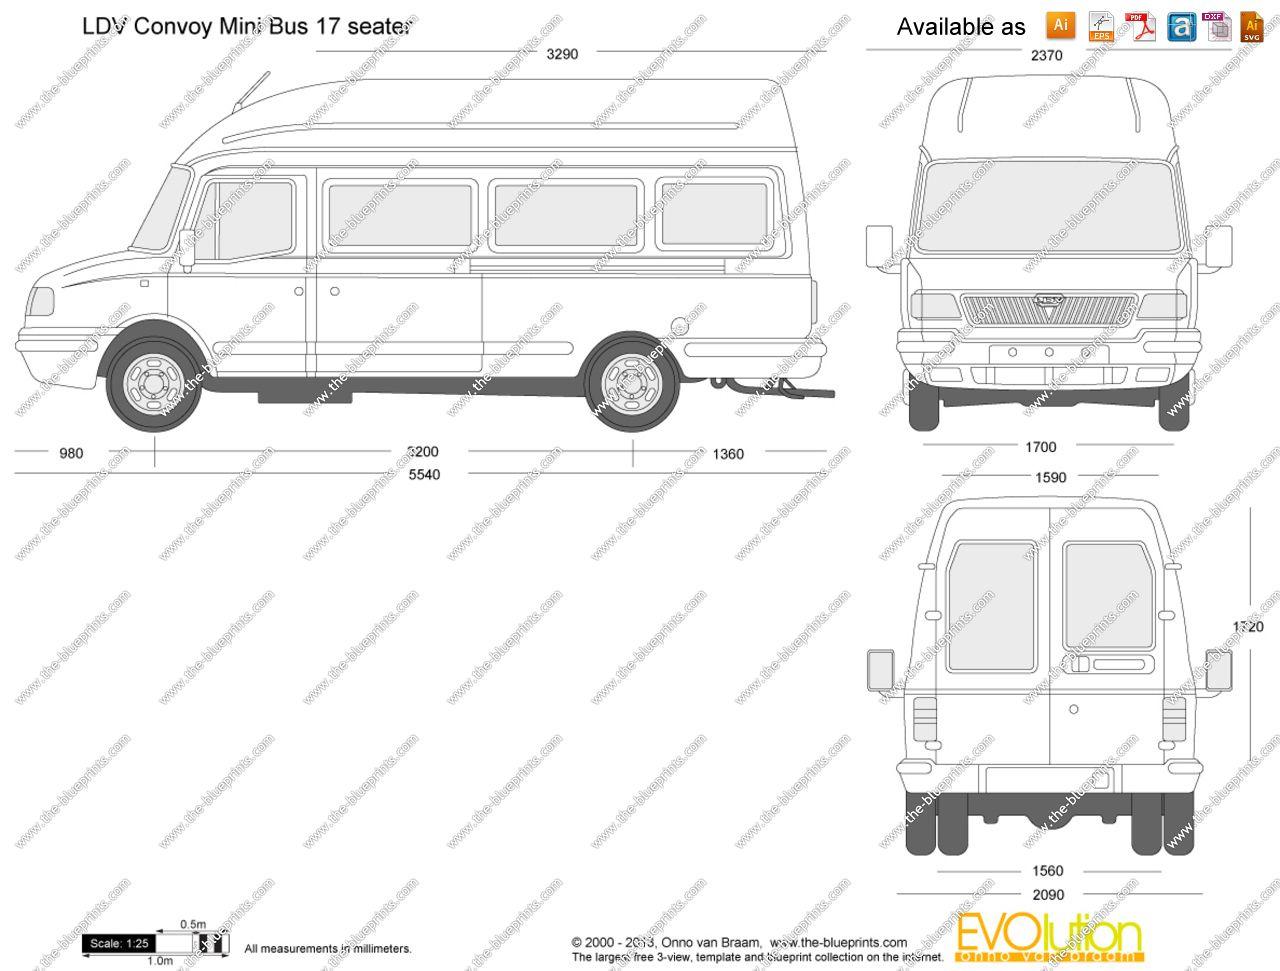 ldv convoy 400 fuse box diagram ldv image wiring ldv convoy internal dimensions google search campervans on ldv convoy 400 fuse box diagram